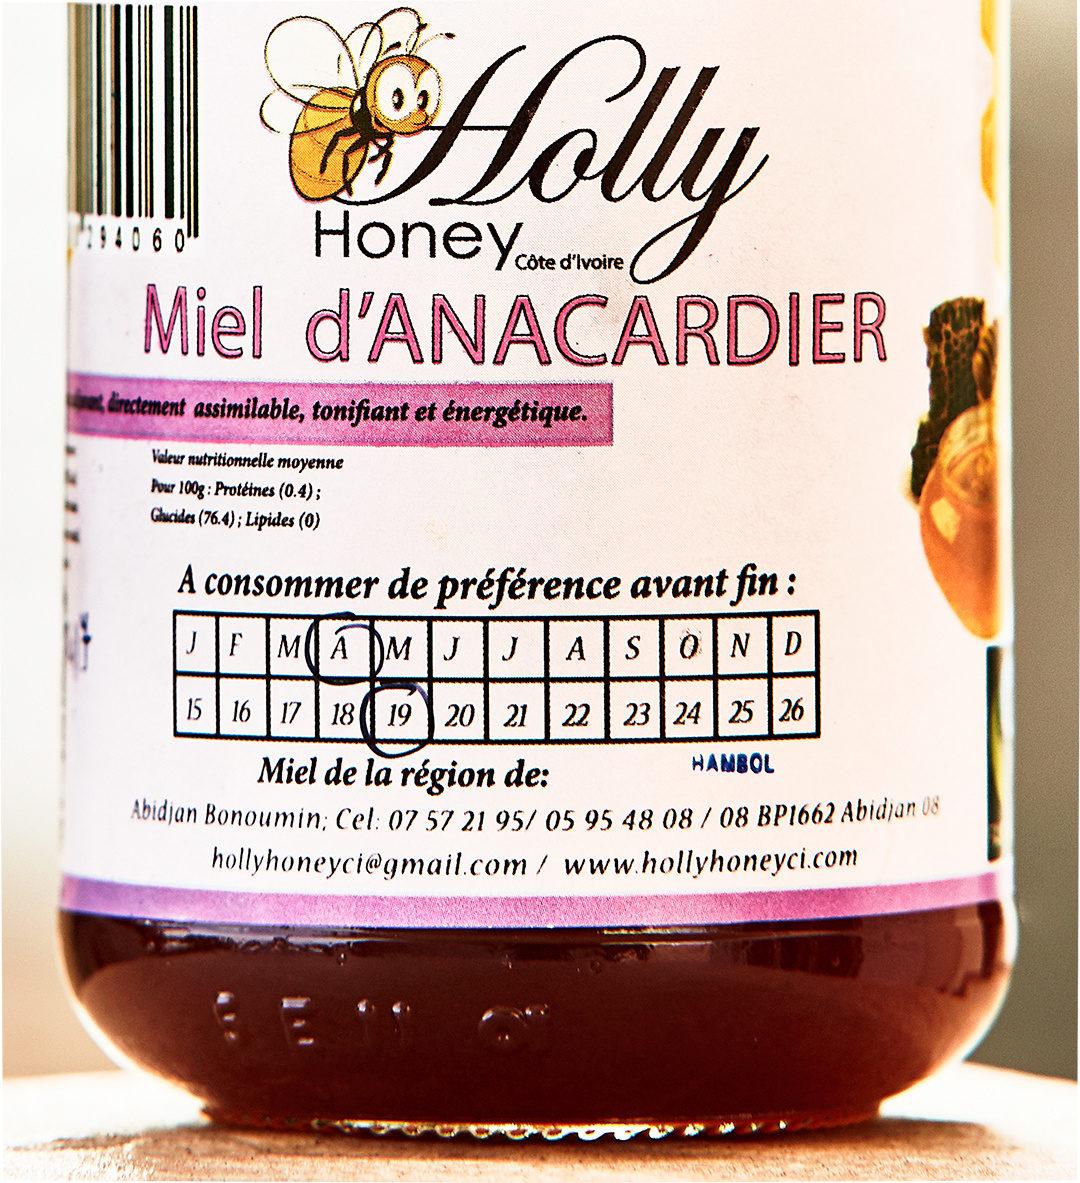 Miel d'Anacardier - Informations nutritionnelles - fr